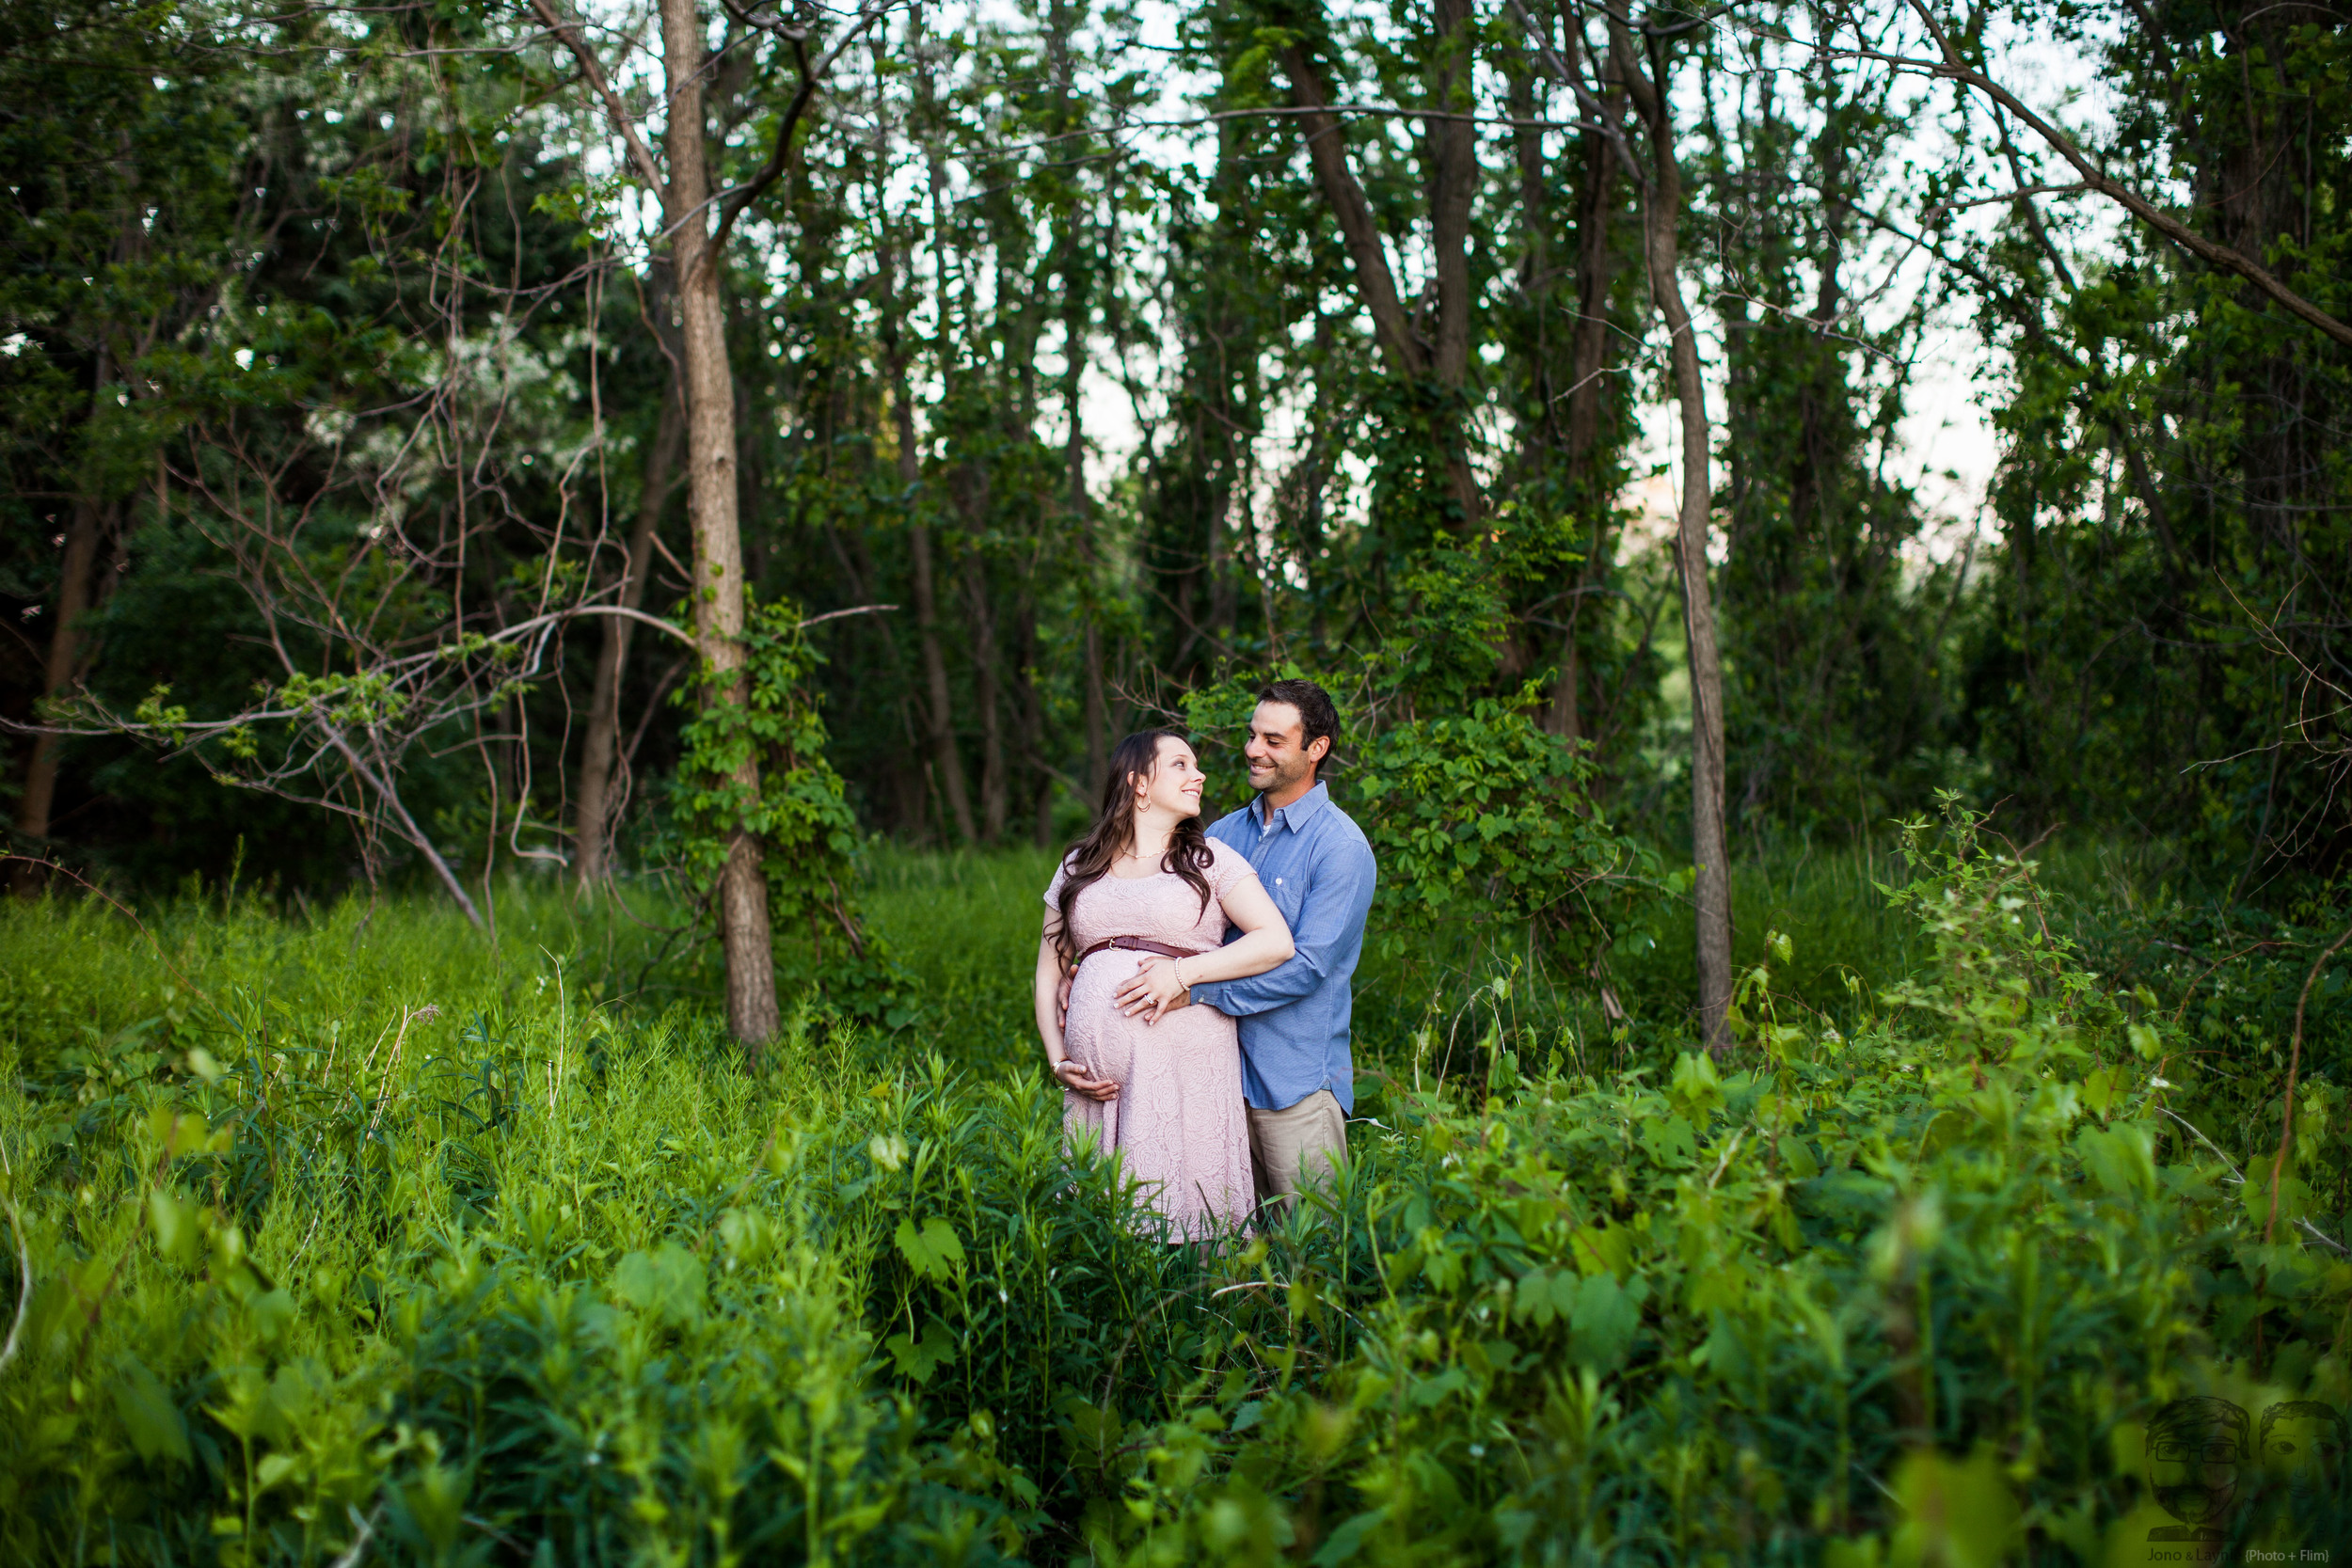 013Toronto photographers-Baby Bump-Jono & Laynie Co.jpg